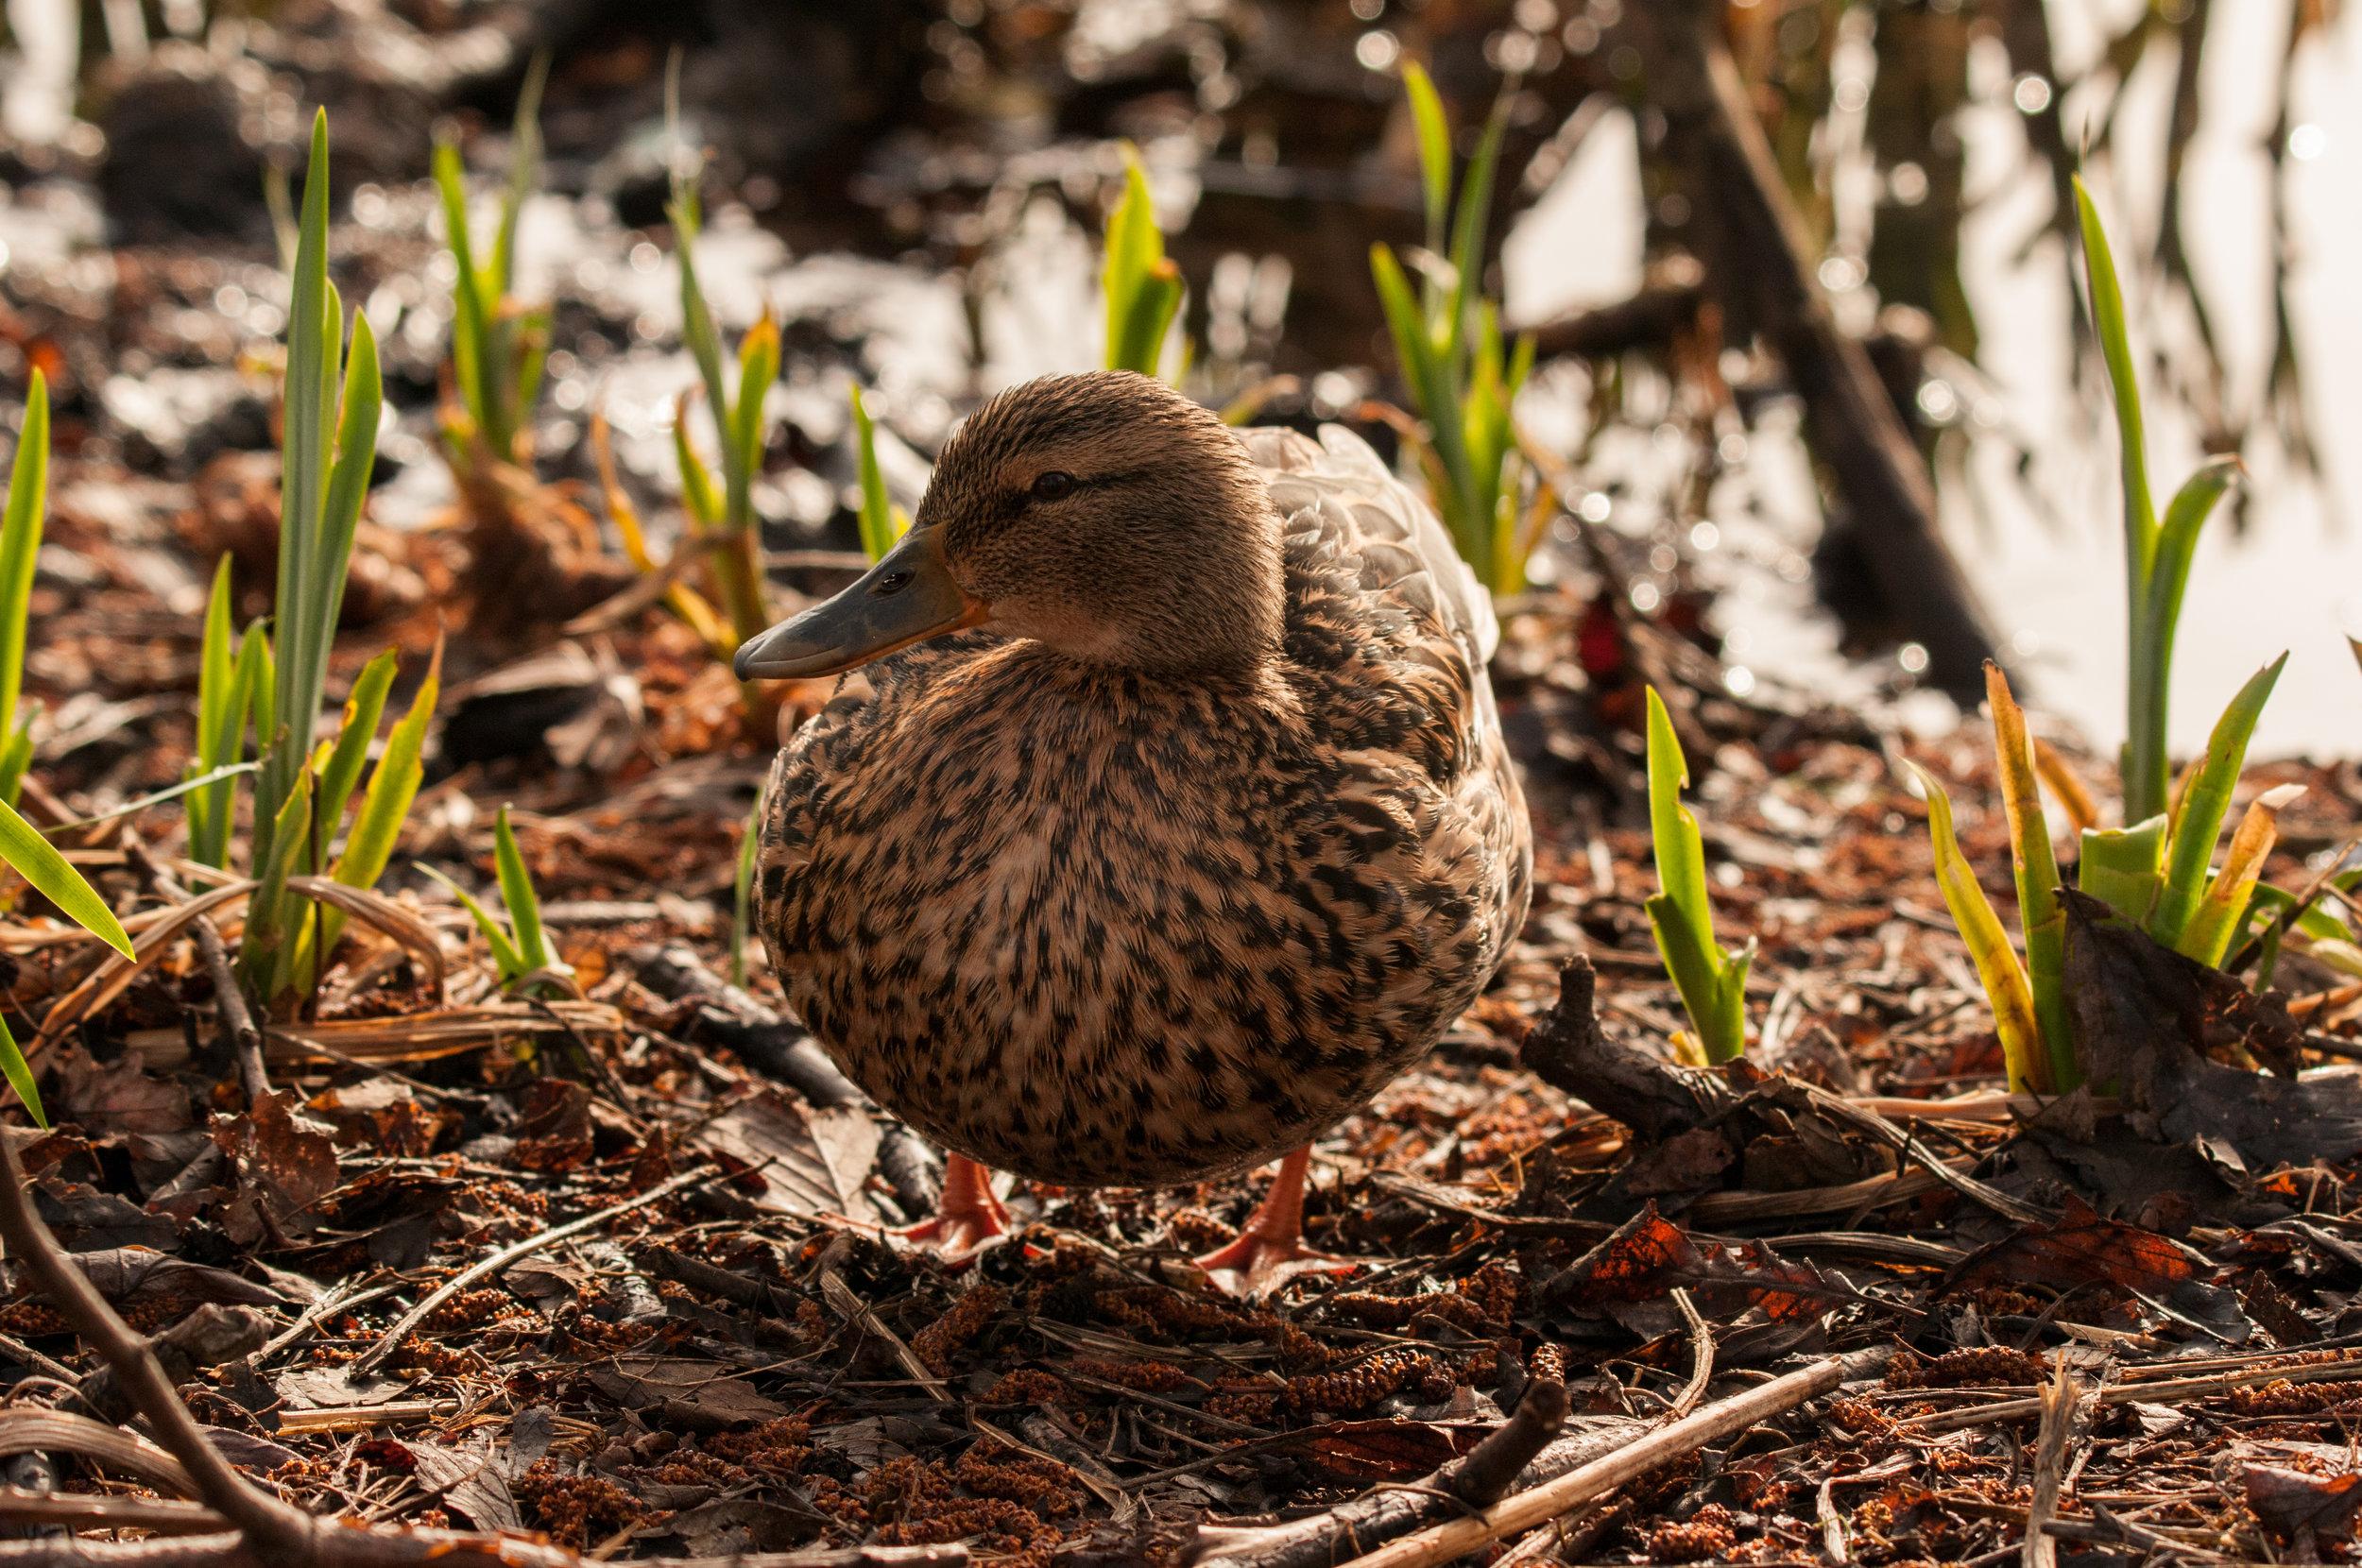 Ptaki Lochend - 2019 - MAR_4544.jpg